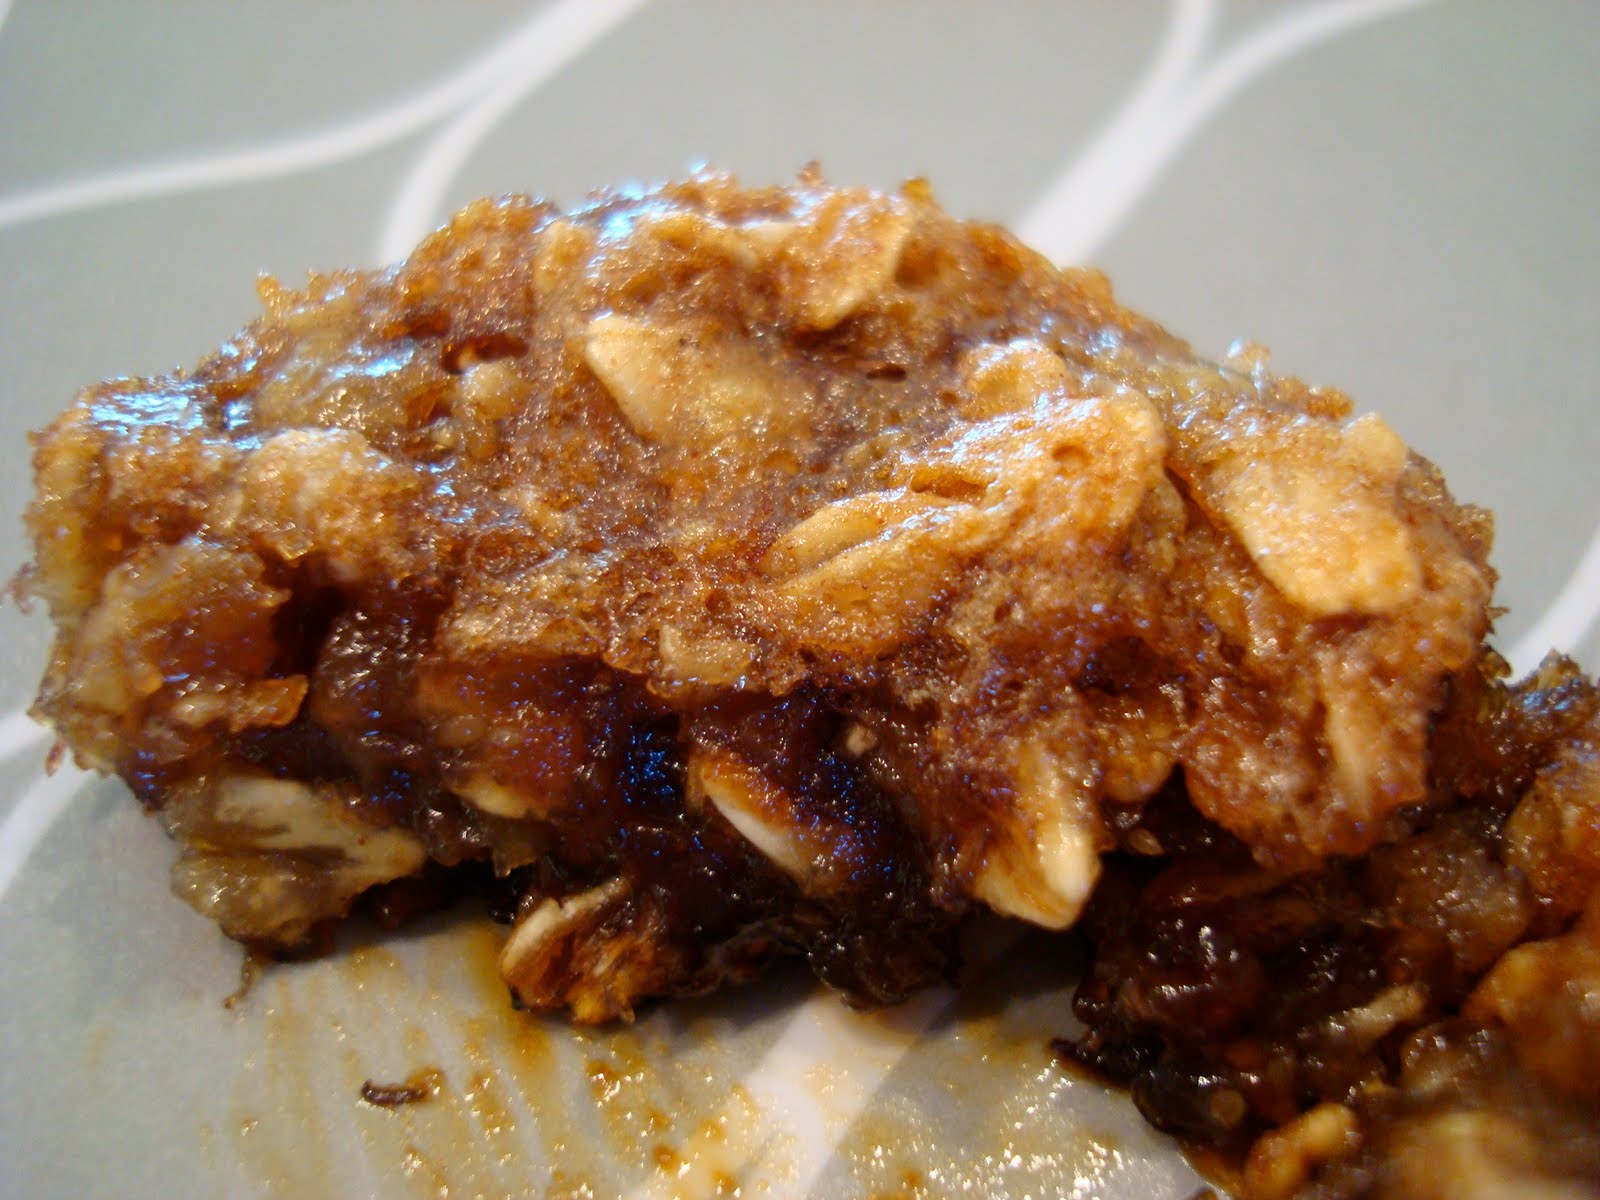 ... Gluten Free Cinnamon Raisin Banana Oatmeal Muffins - Averie Cooks